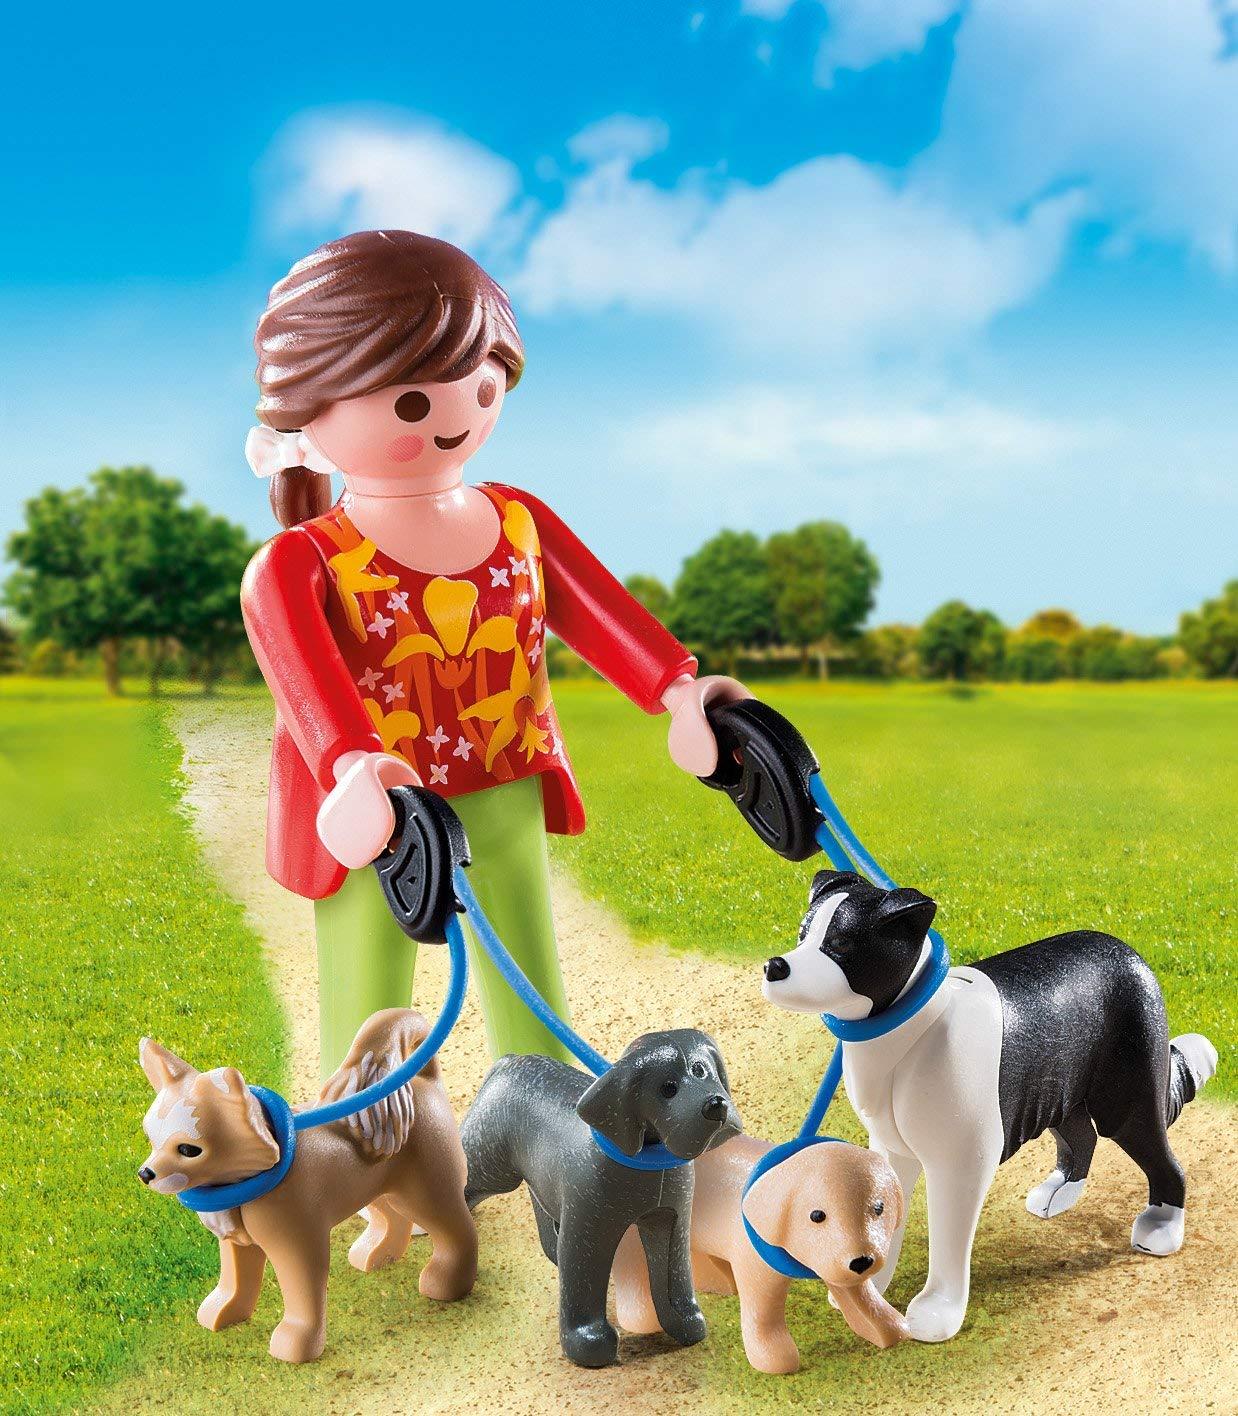 Amazon.com: Playmobil - Andador para perros (renovado): Toys ...